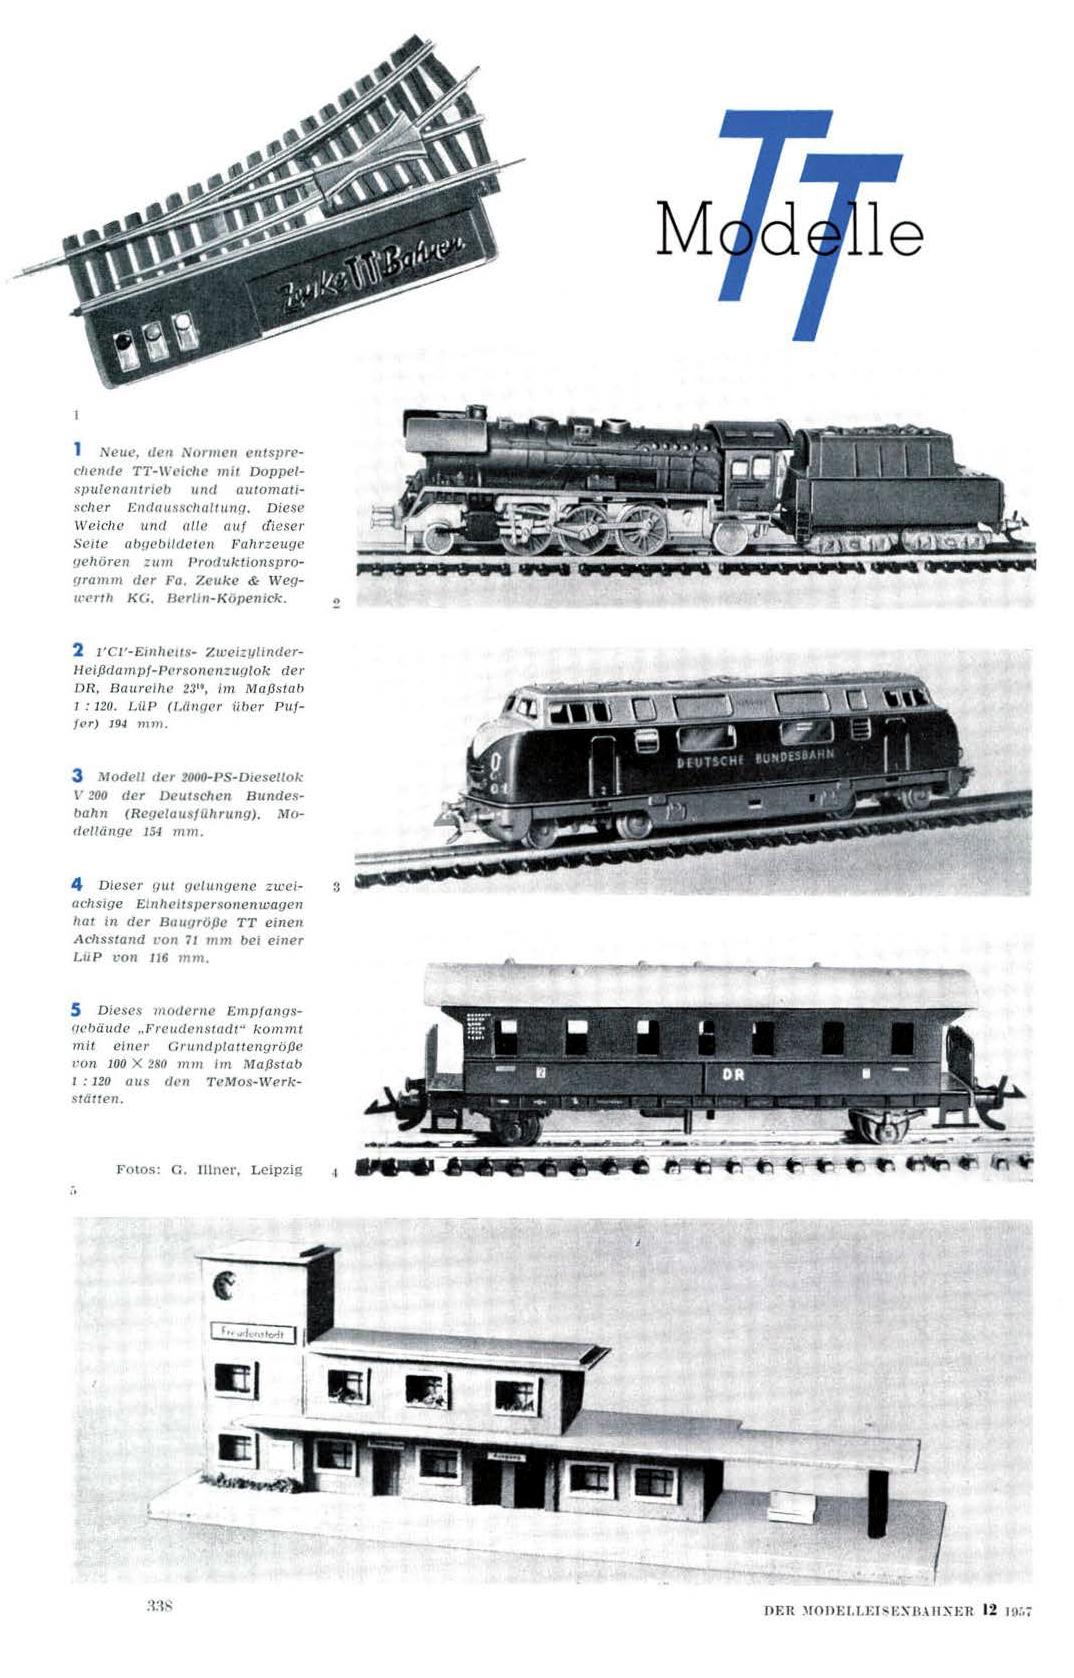 Fragment artykułu o wielkości TT w ModelEisenbahner 12/1957: https://archive.org/details/ModellEisenbahner/mode/2up